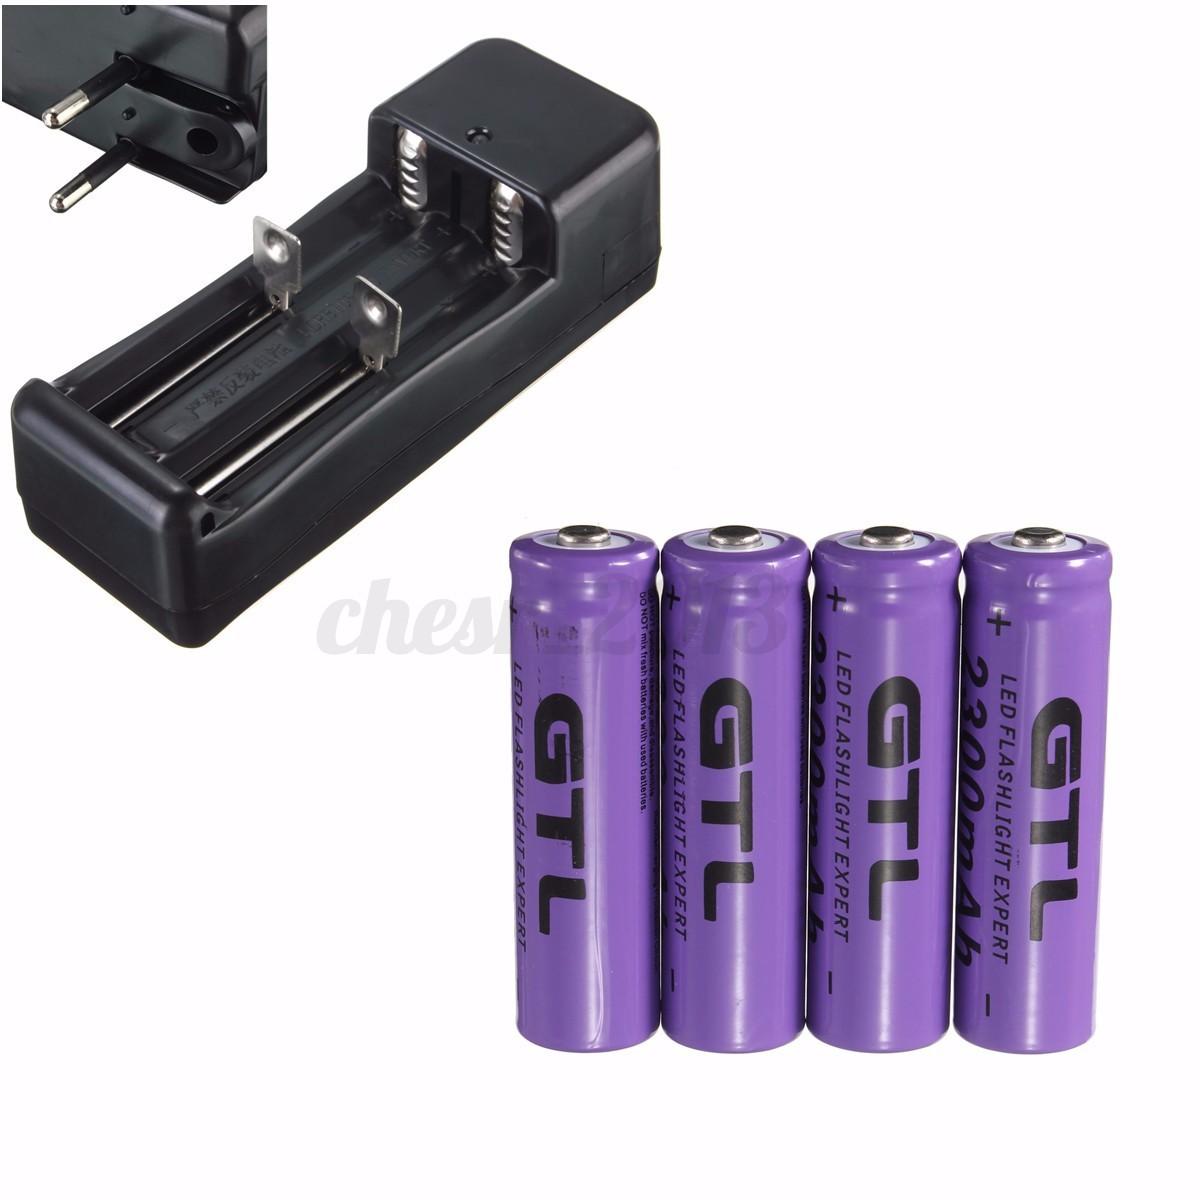 3.7V 2300mAh 14500 AA Li-ion Rechargeable Battery batteria RICARICABILE CARICA  eBay